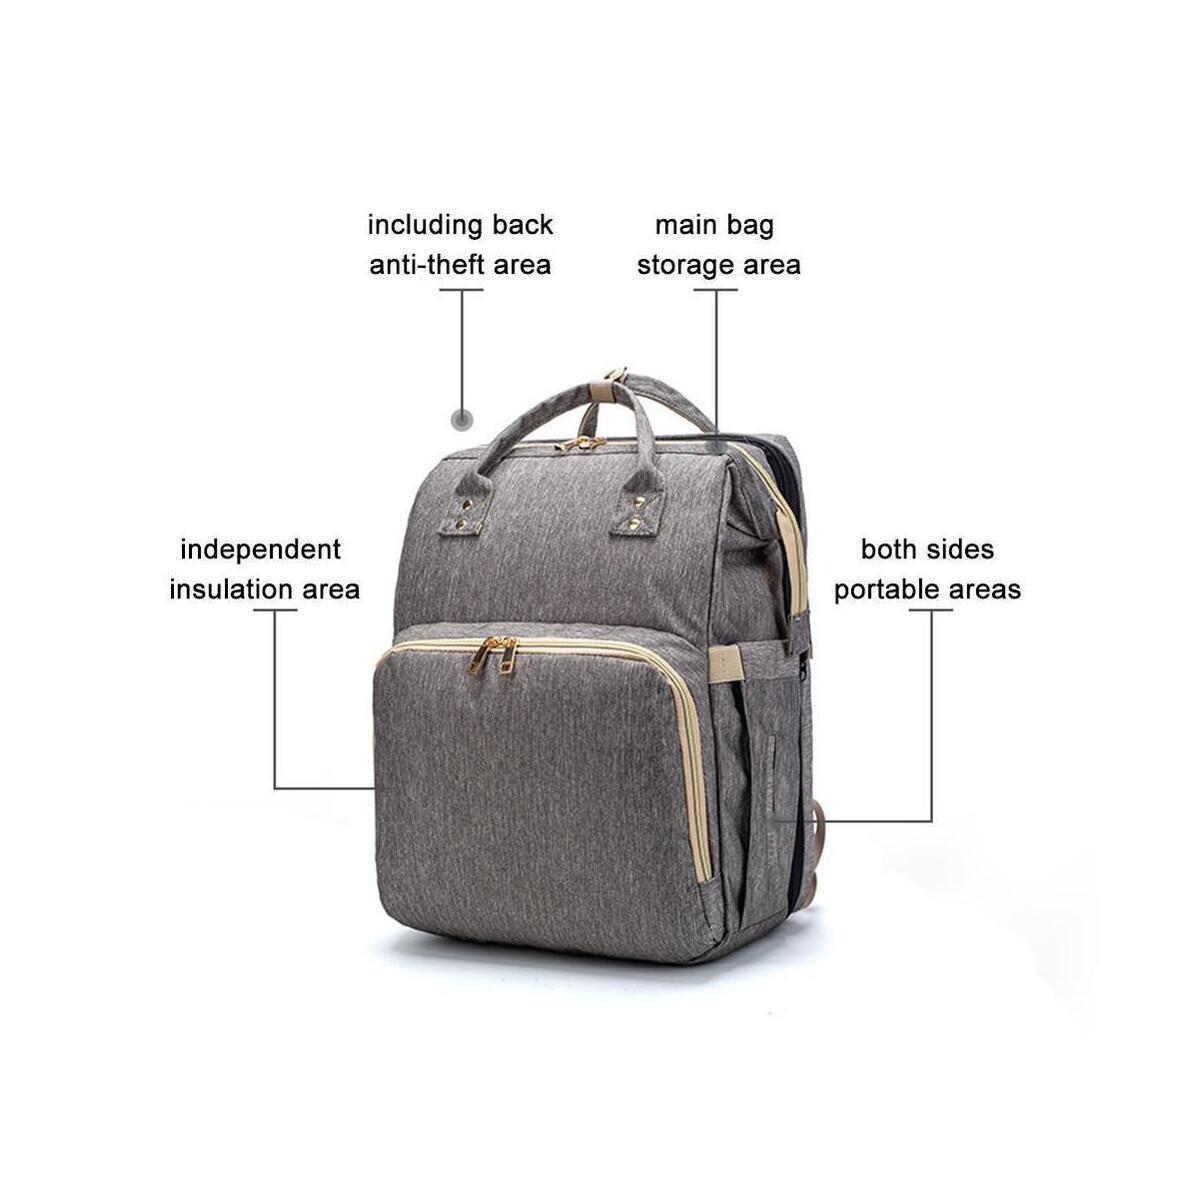 EXPANDING DIAPER TRAVEL BAG